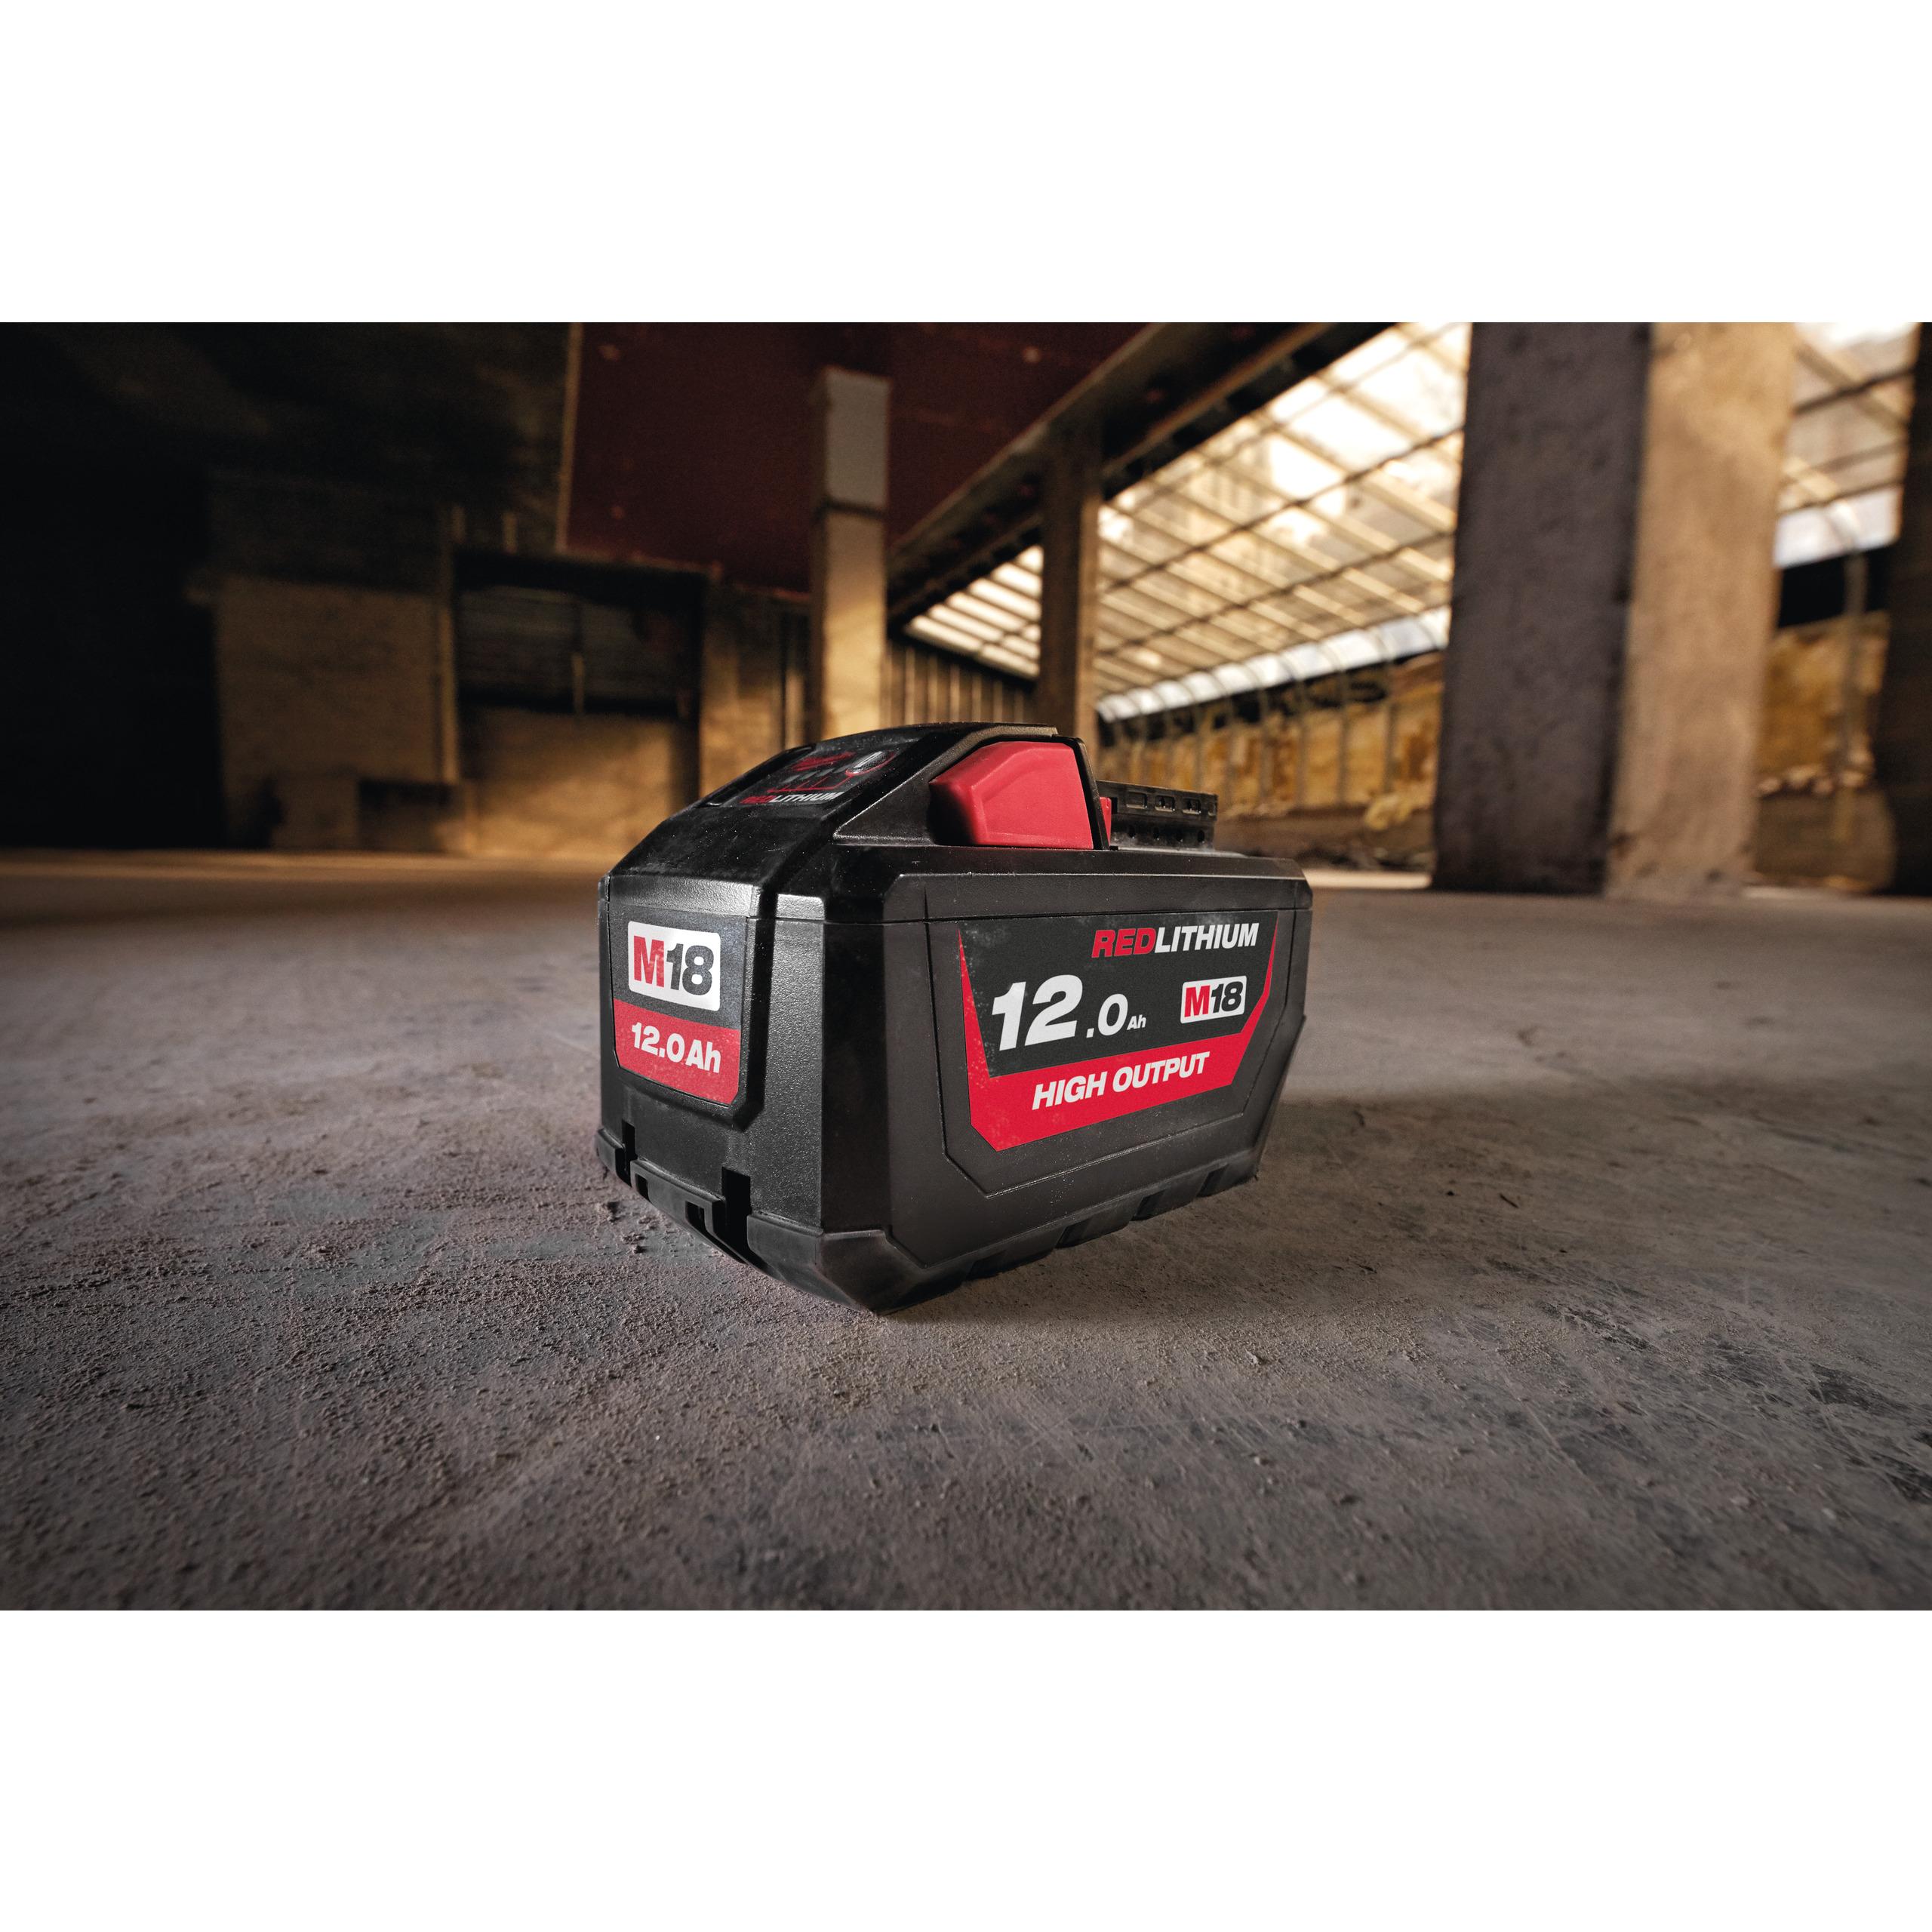 Akumulátor M18™ High Output™ 12.0 Ah